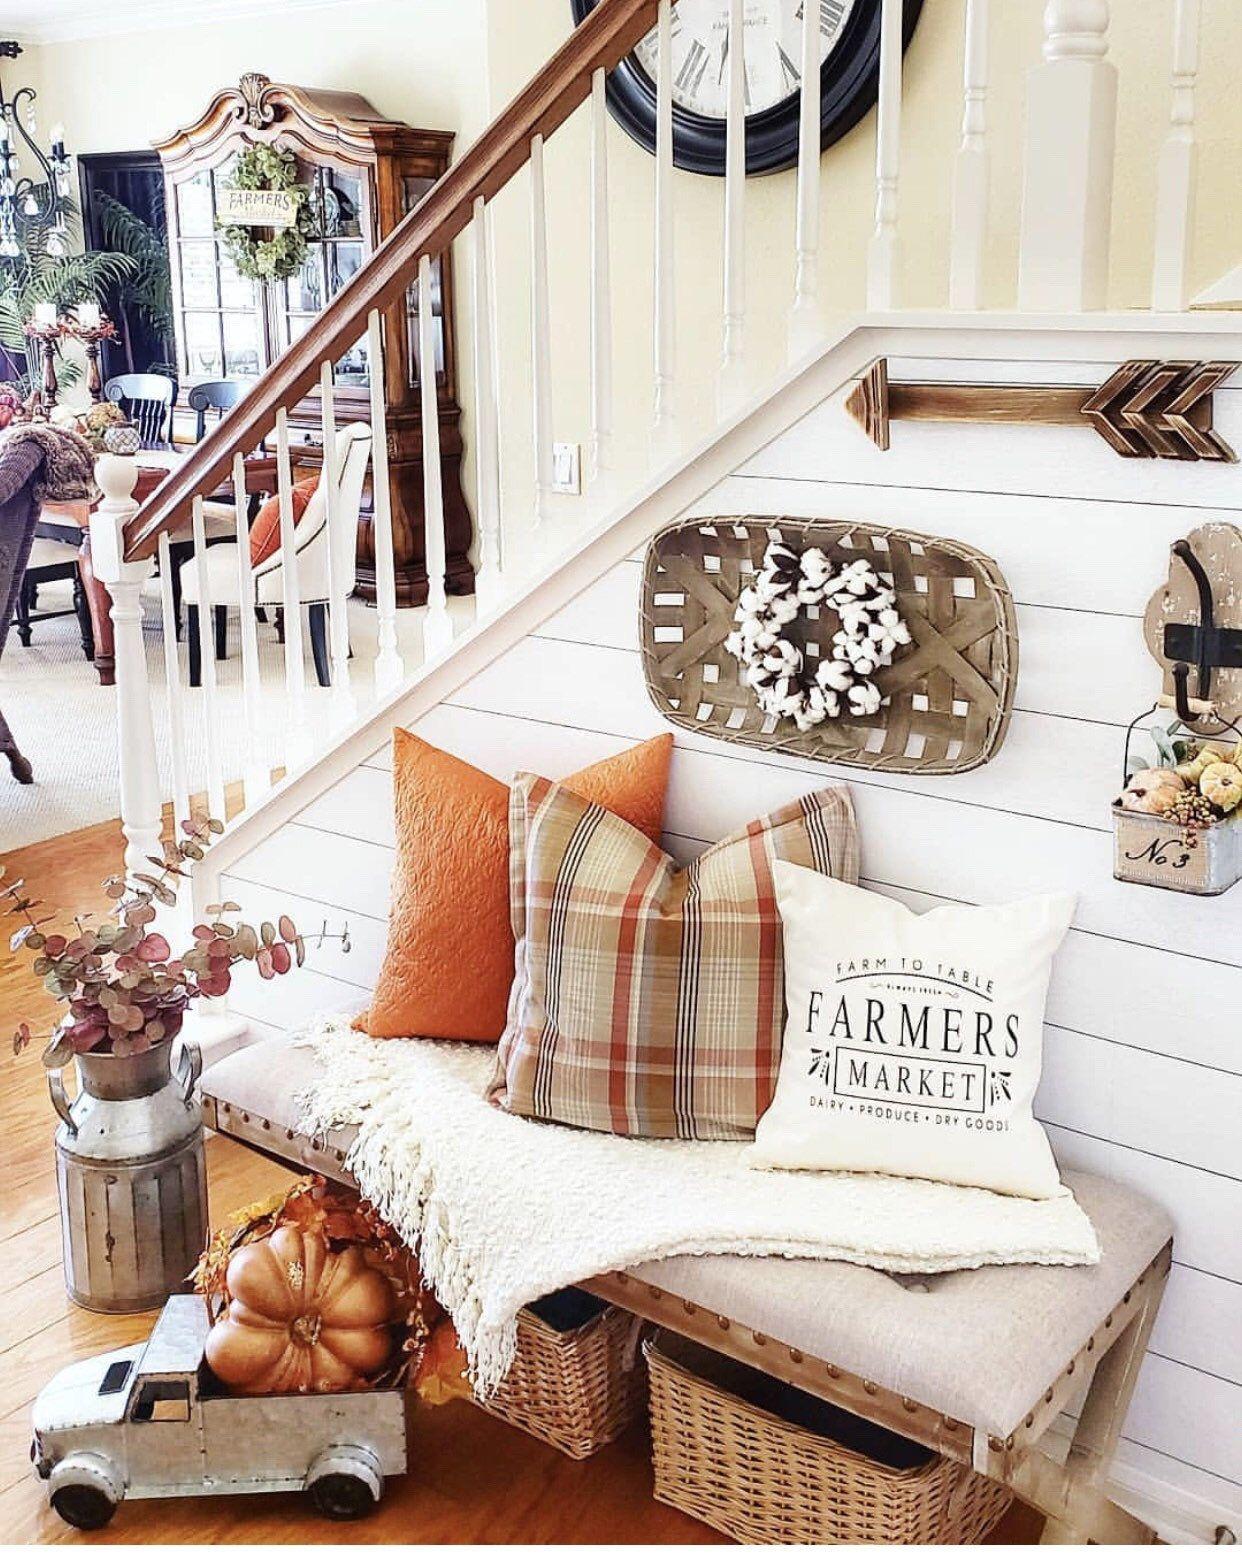 farmers market pillow cover, Joanna Gaines style, farmhouse style, modern farmhouse decor, fixer upper decor